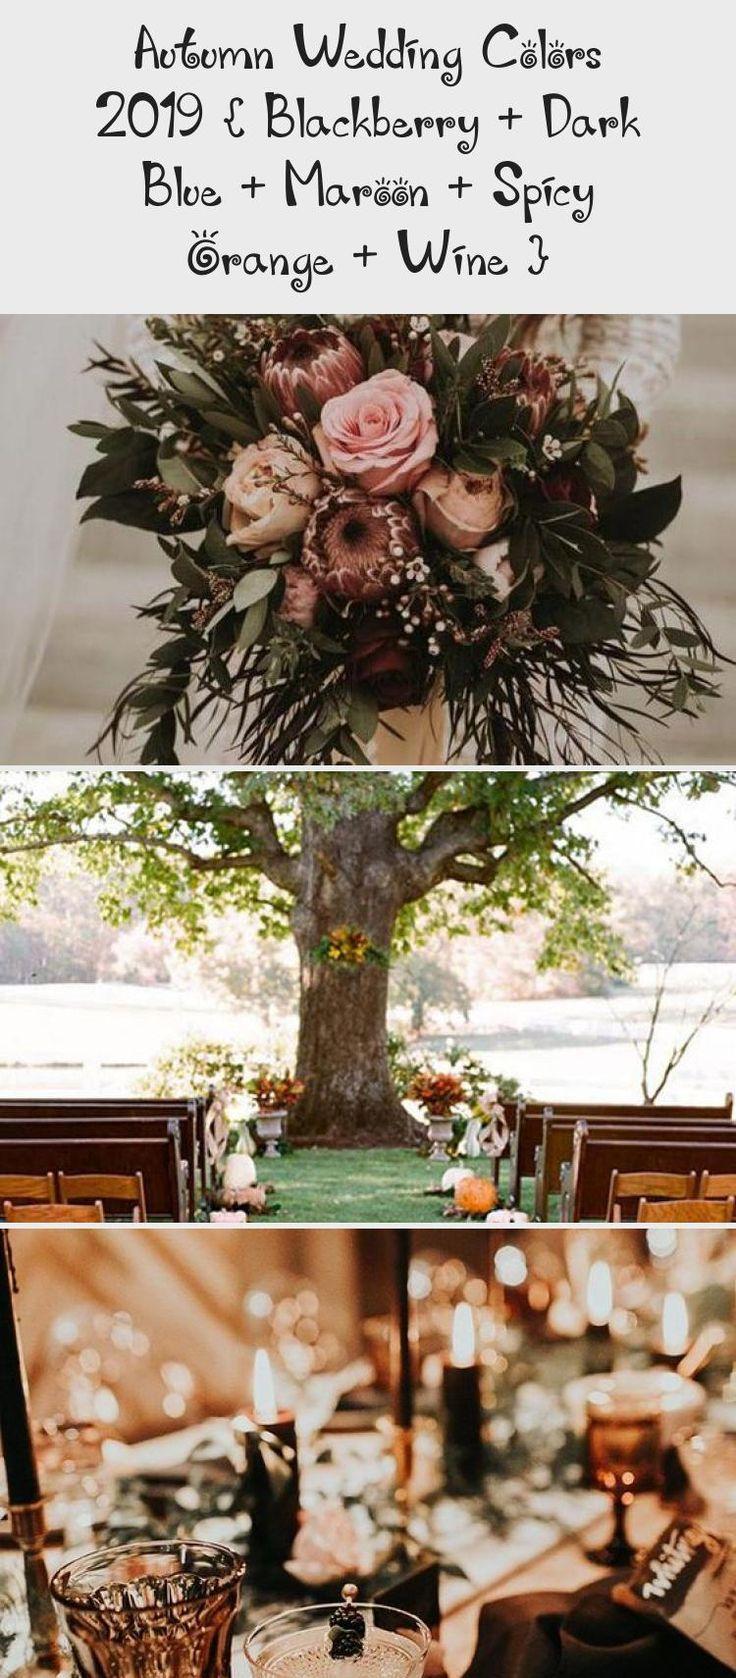 Autumn wedding colors 2019 { Blackberry + Dark Blue + Maroon + Spicy Orange + Wine } #color #fall #autumn #wedding #FloralBridesmaidDresses #BridesmaidDressesBlue #BridesmaidDressesCountry #SilverBridesmaidDresses #RusticBridesmaidDresses